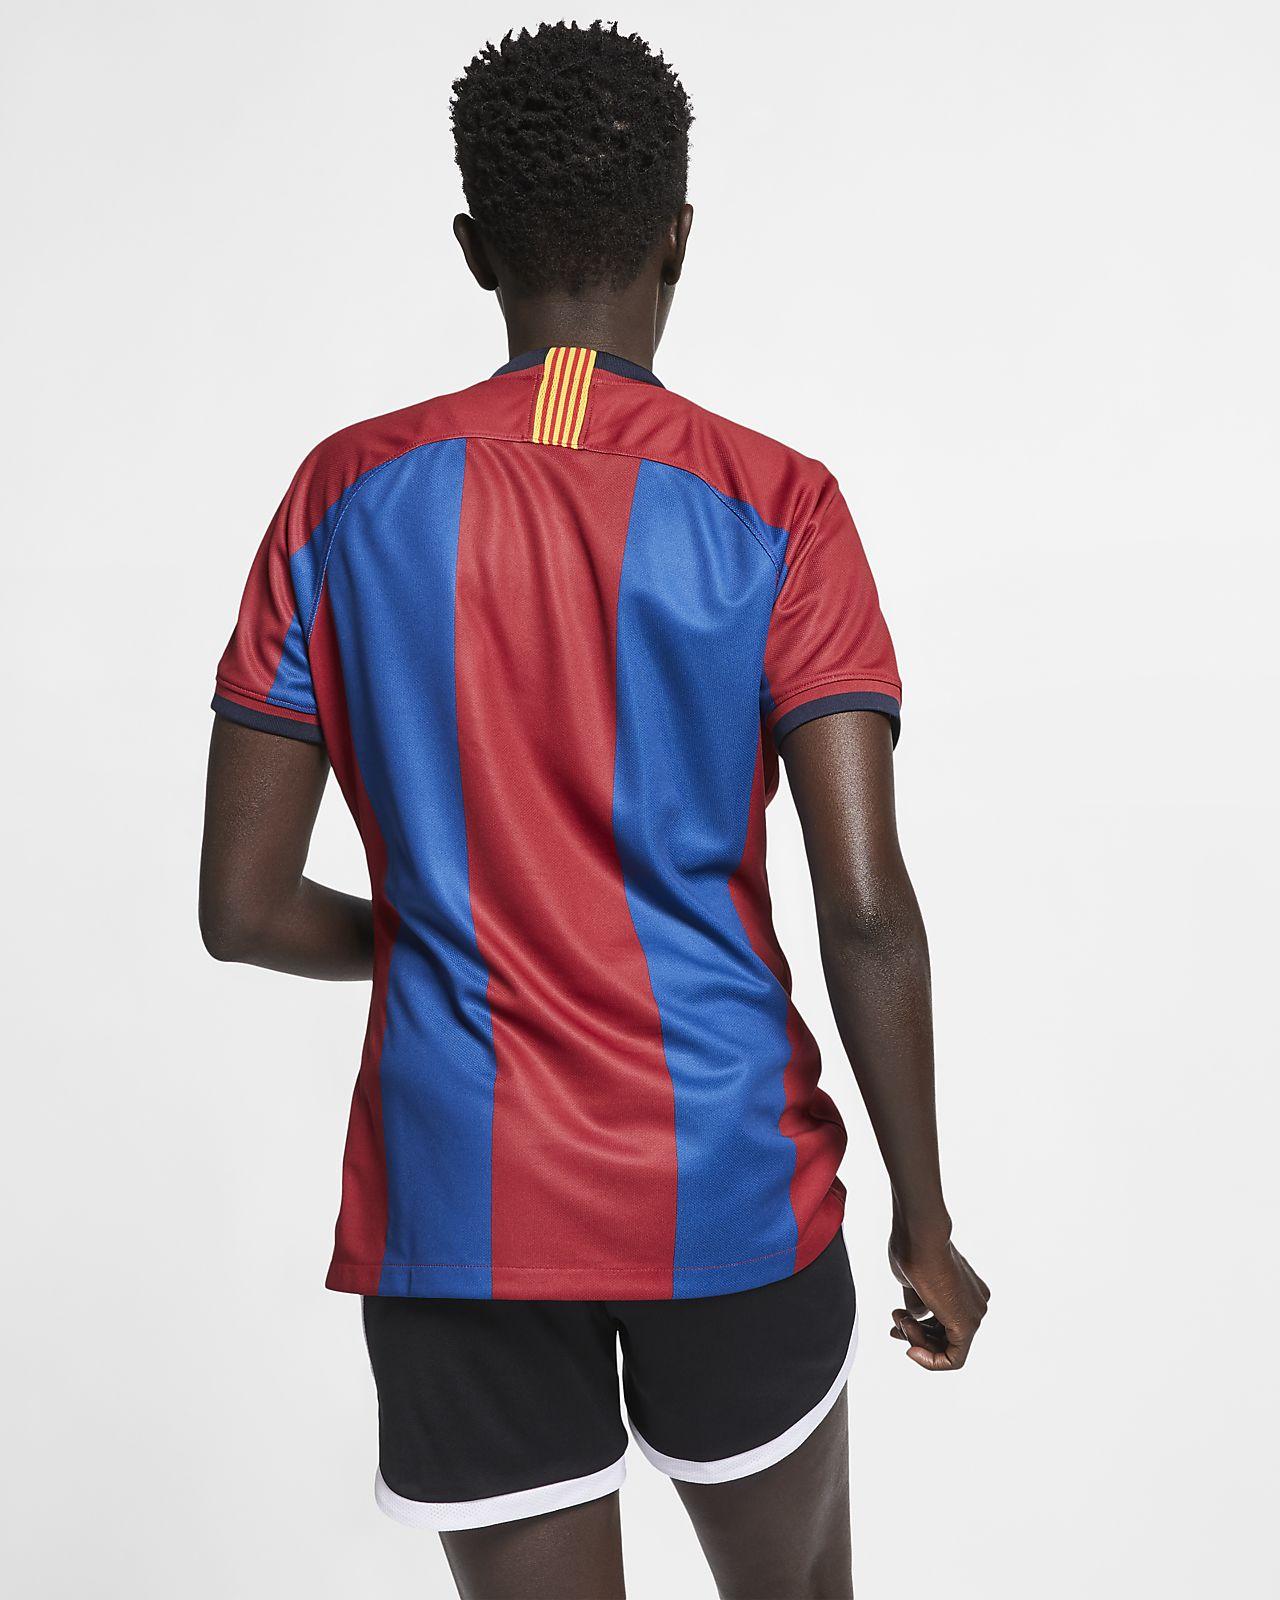 7f9b8c1827c Fc Barcelona Stadium 98 - Querciacb